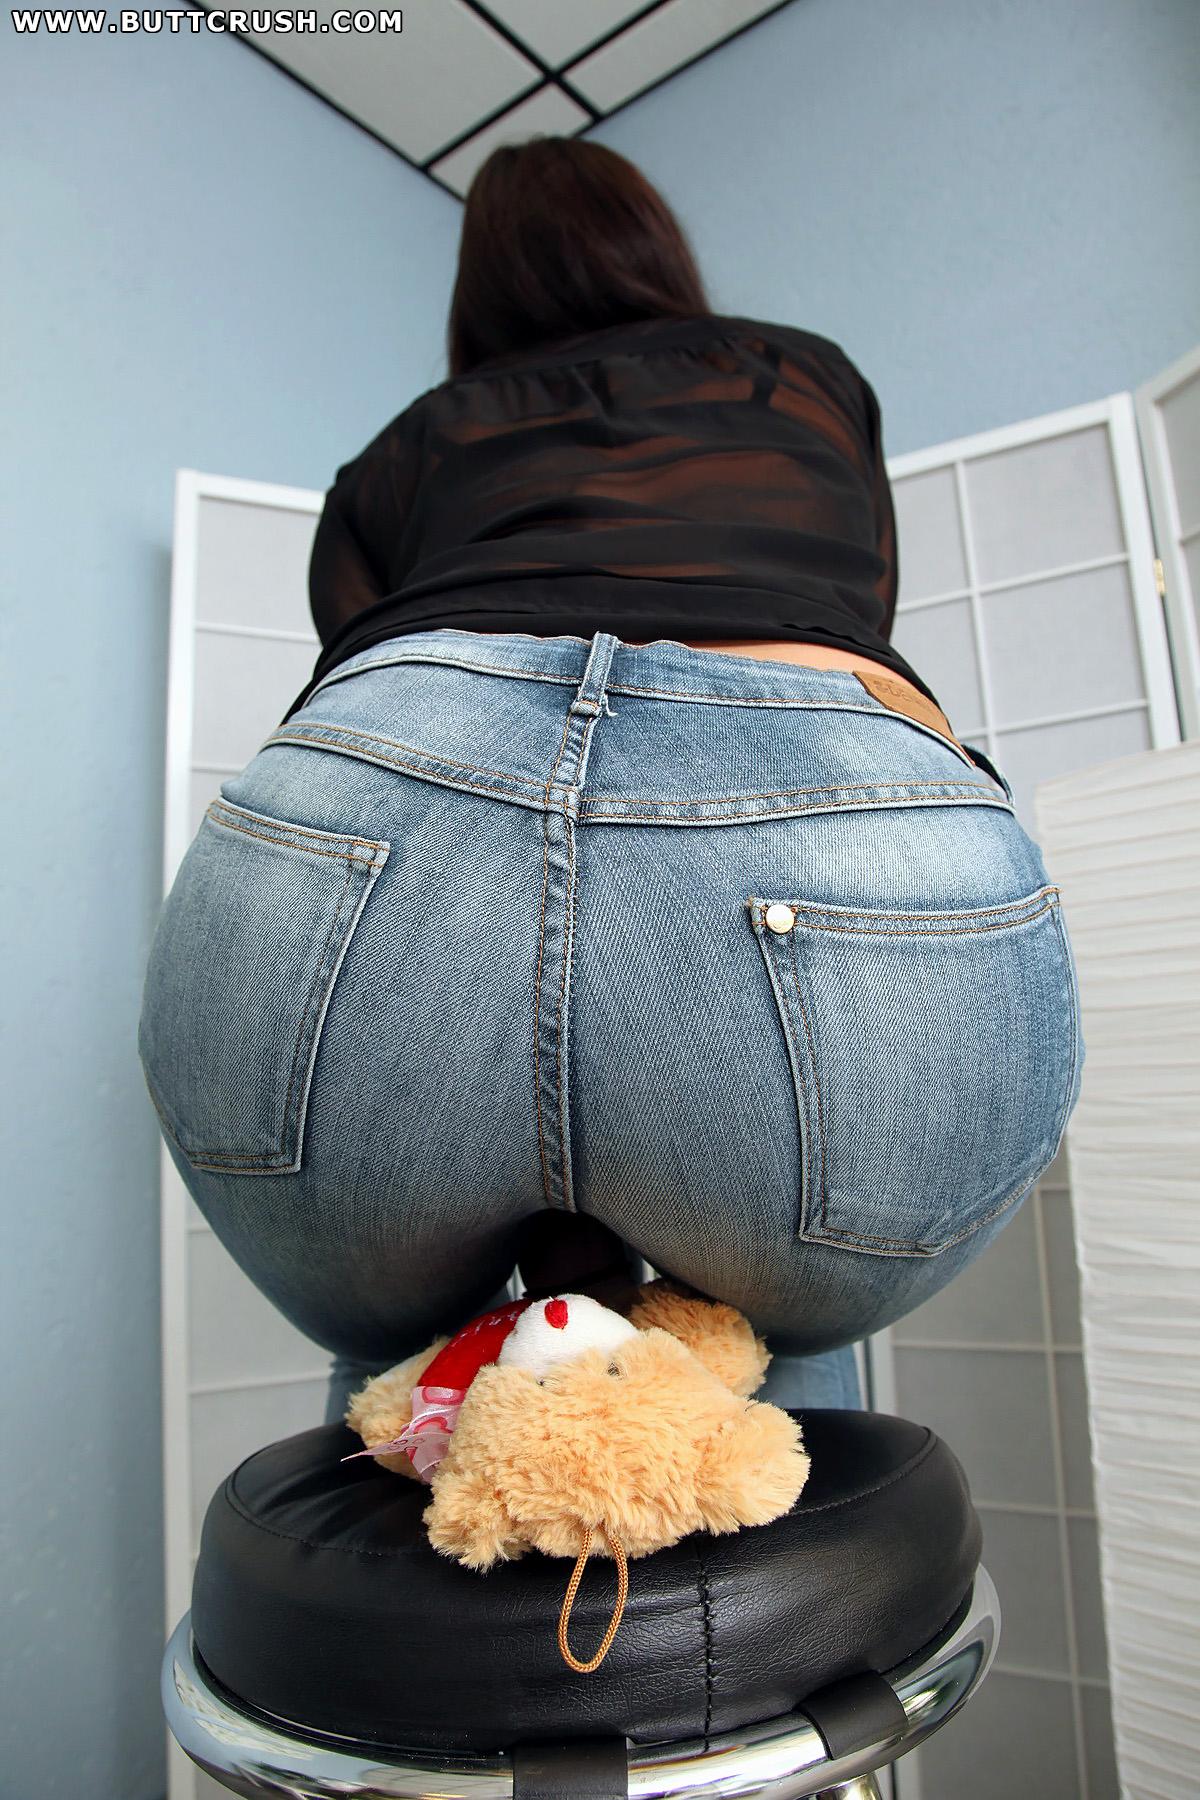 Doll buttcrush